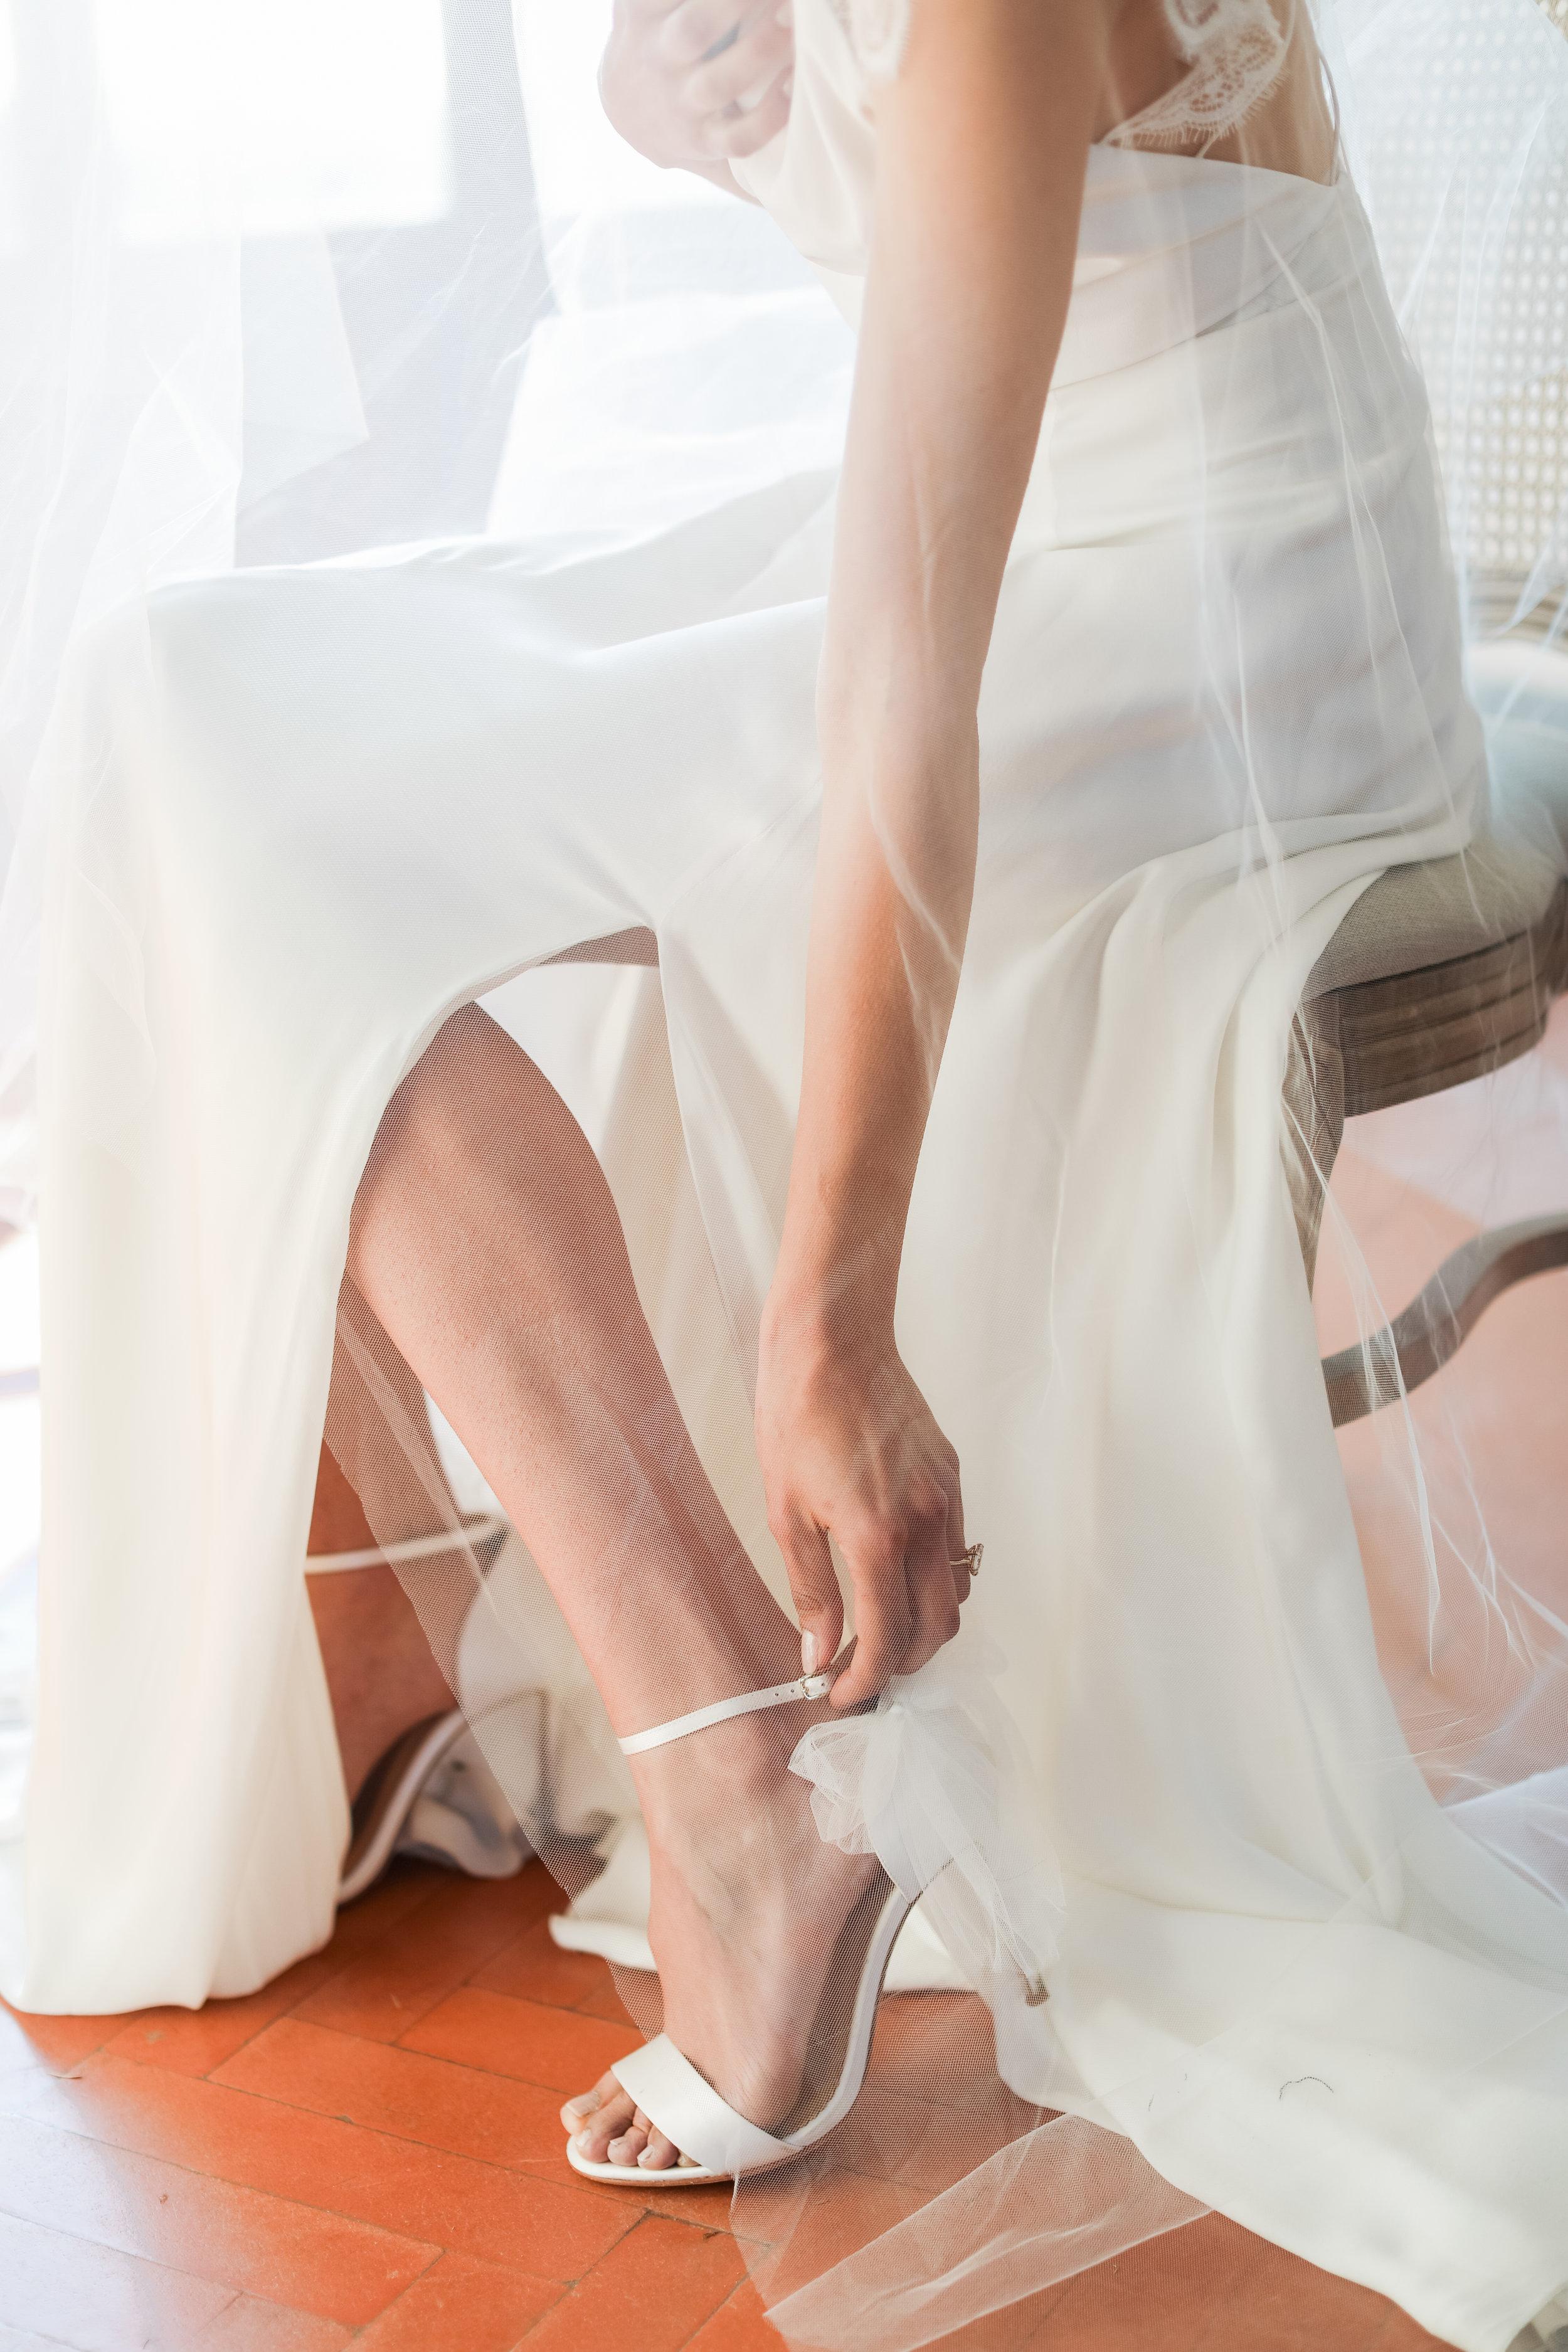 tuscany-wedding-photographer-31.jpg